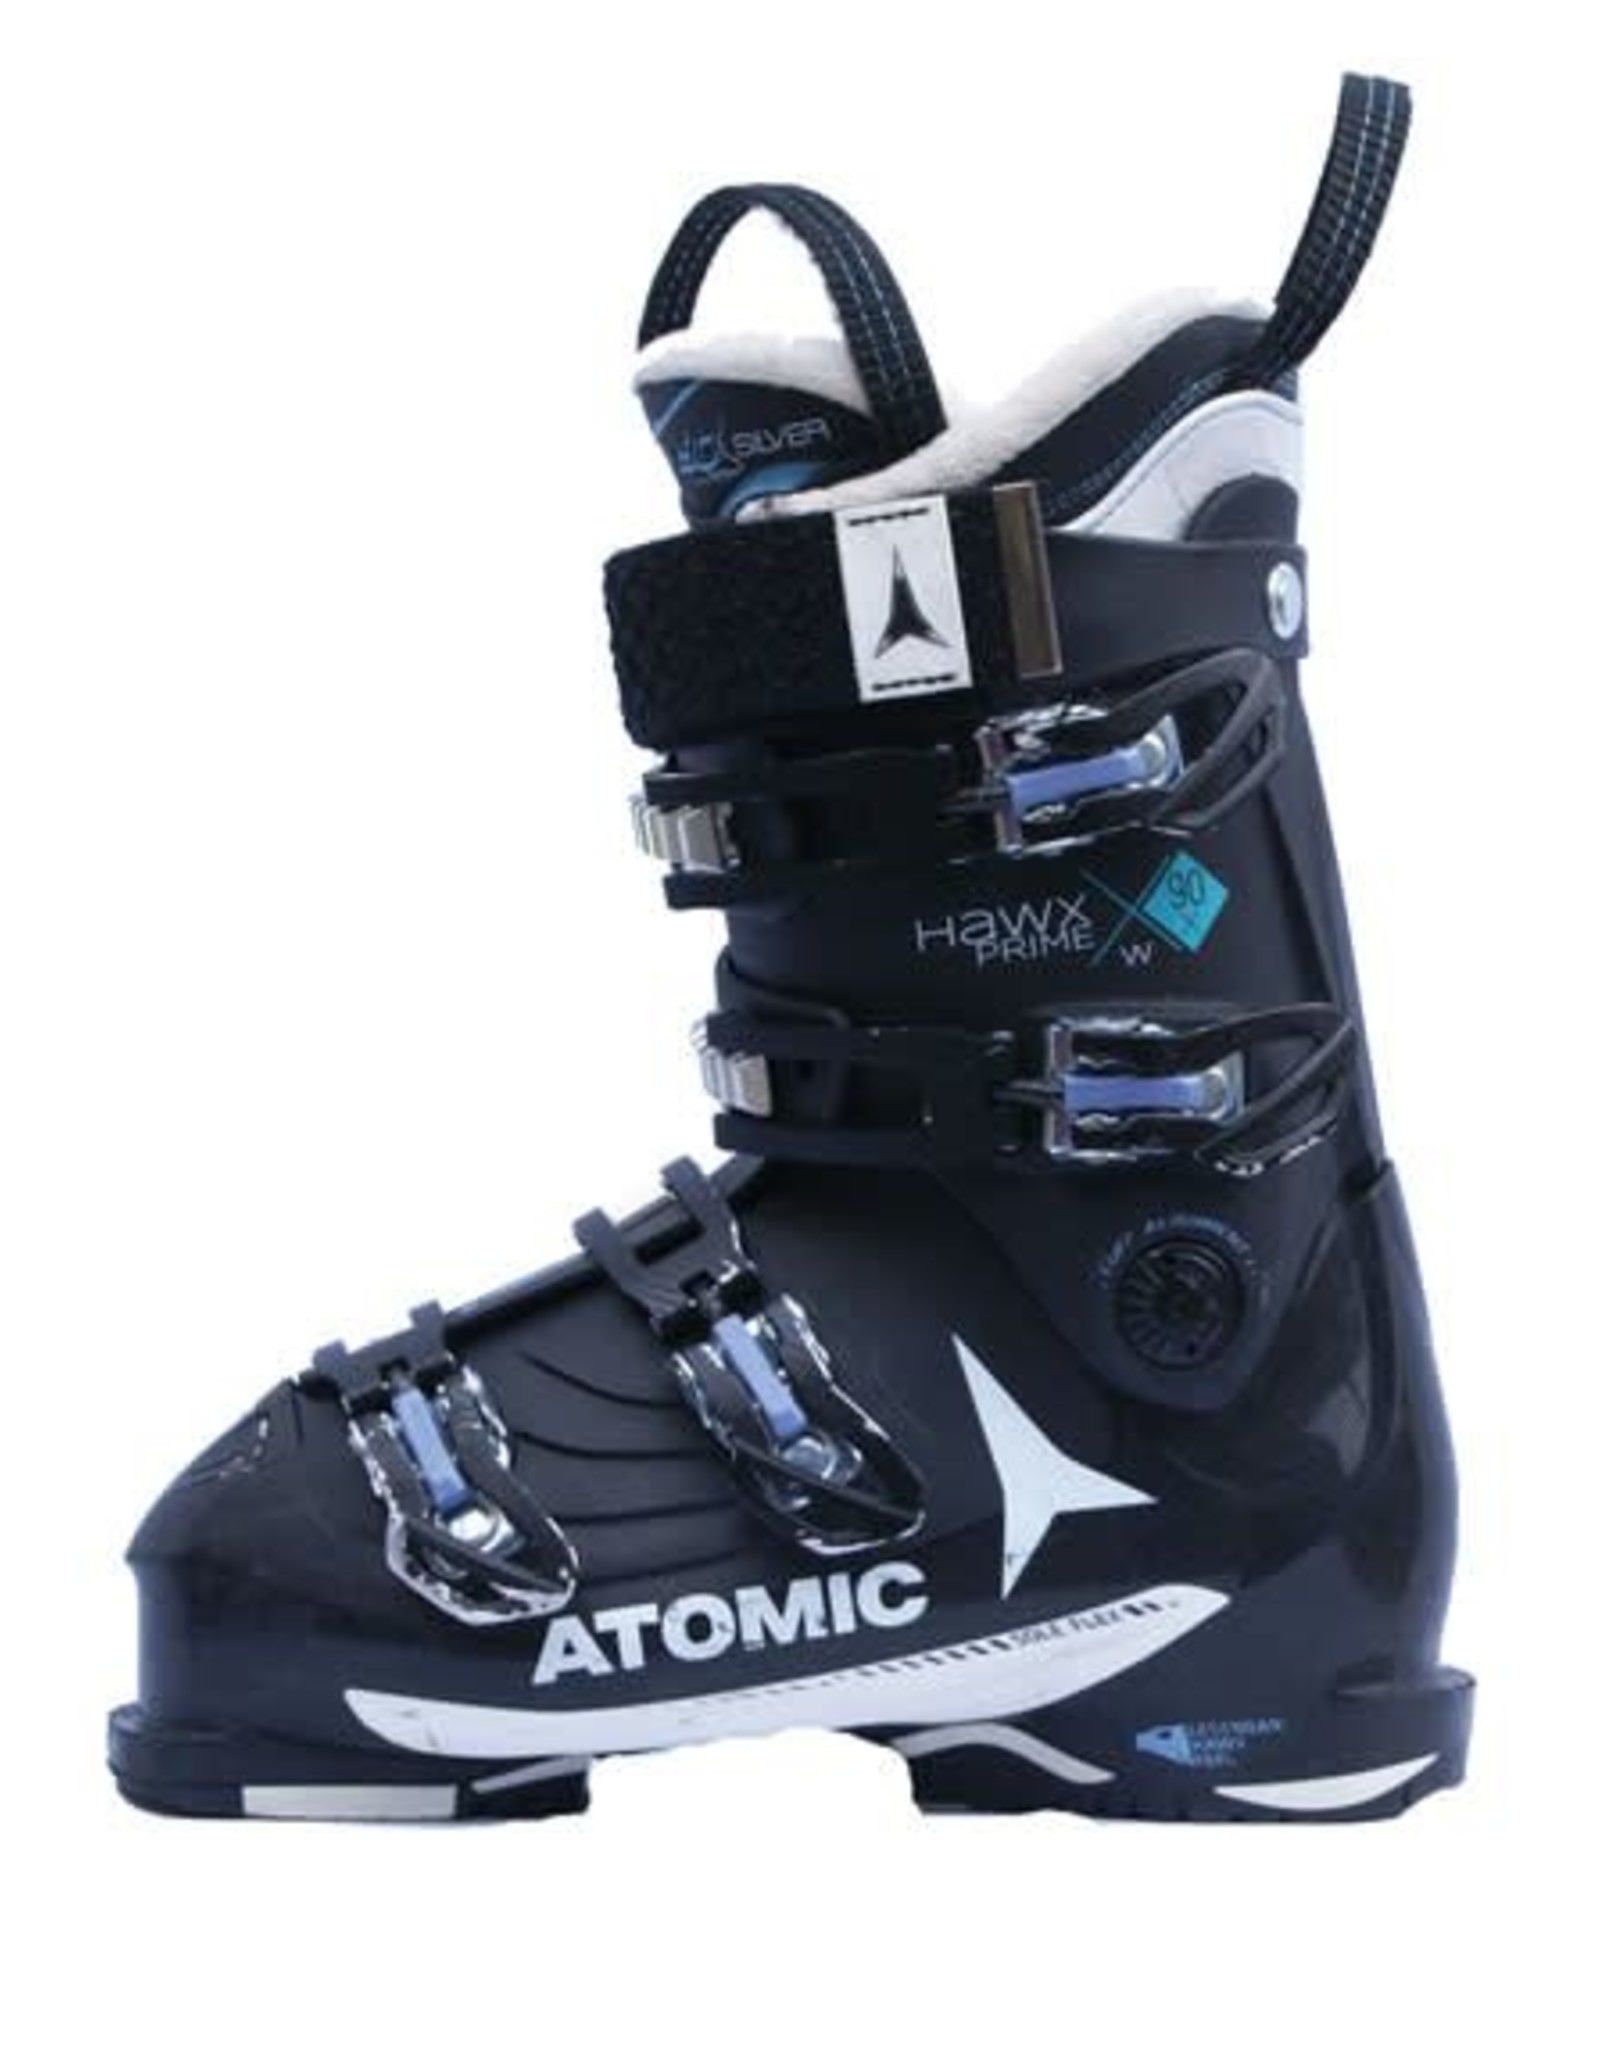 ATOMIC Skischoenen ATOMIC Hawx Prime W90X Gebruikt